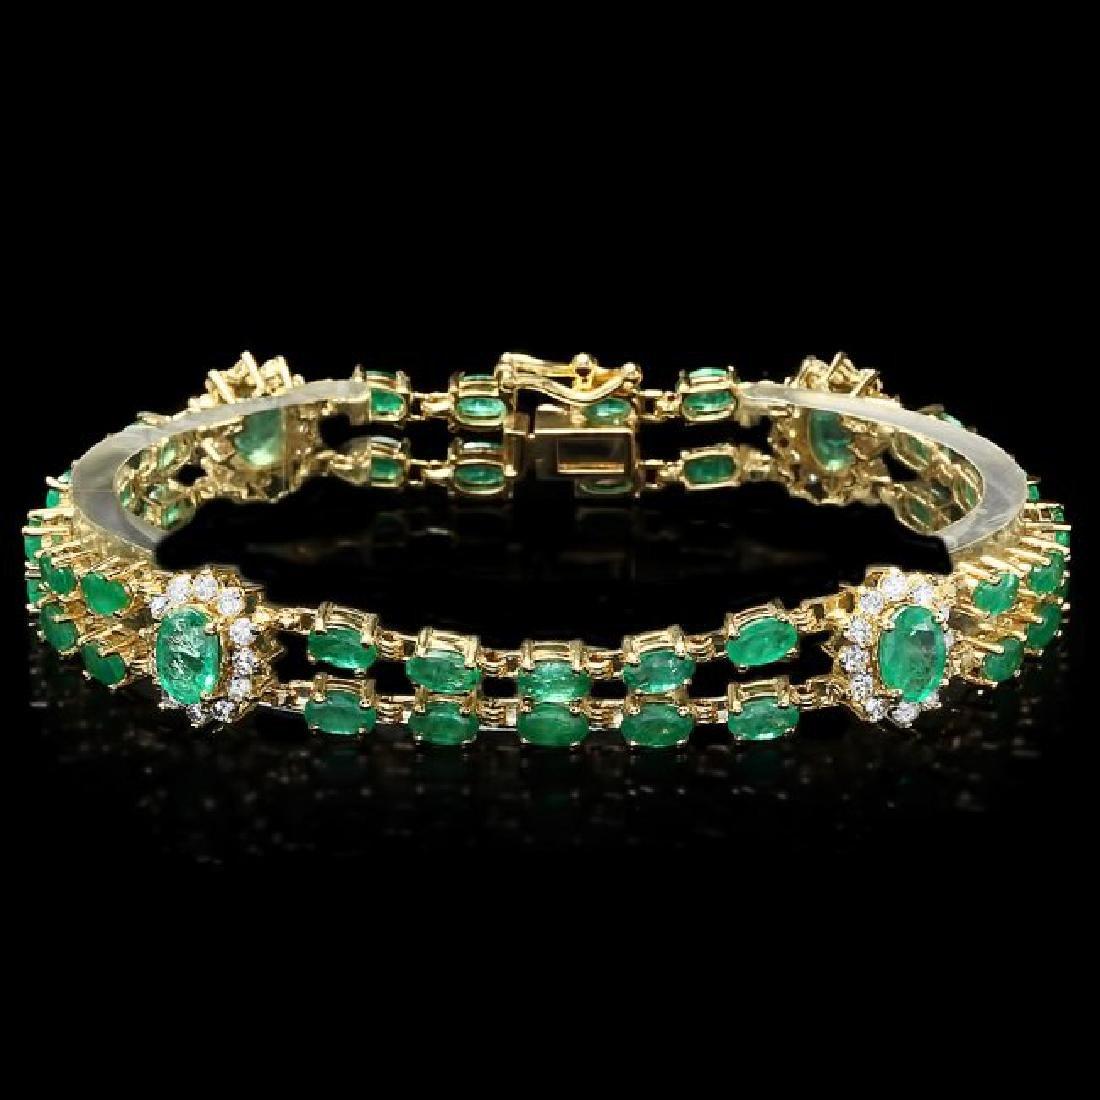 14k Gold 12.00ct Emerald 1.50ct Diamond Bracelet - 2